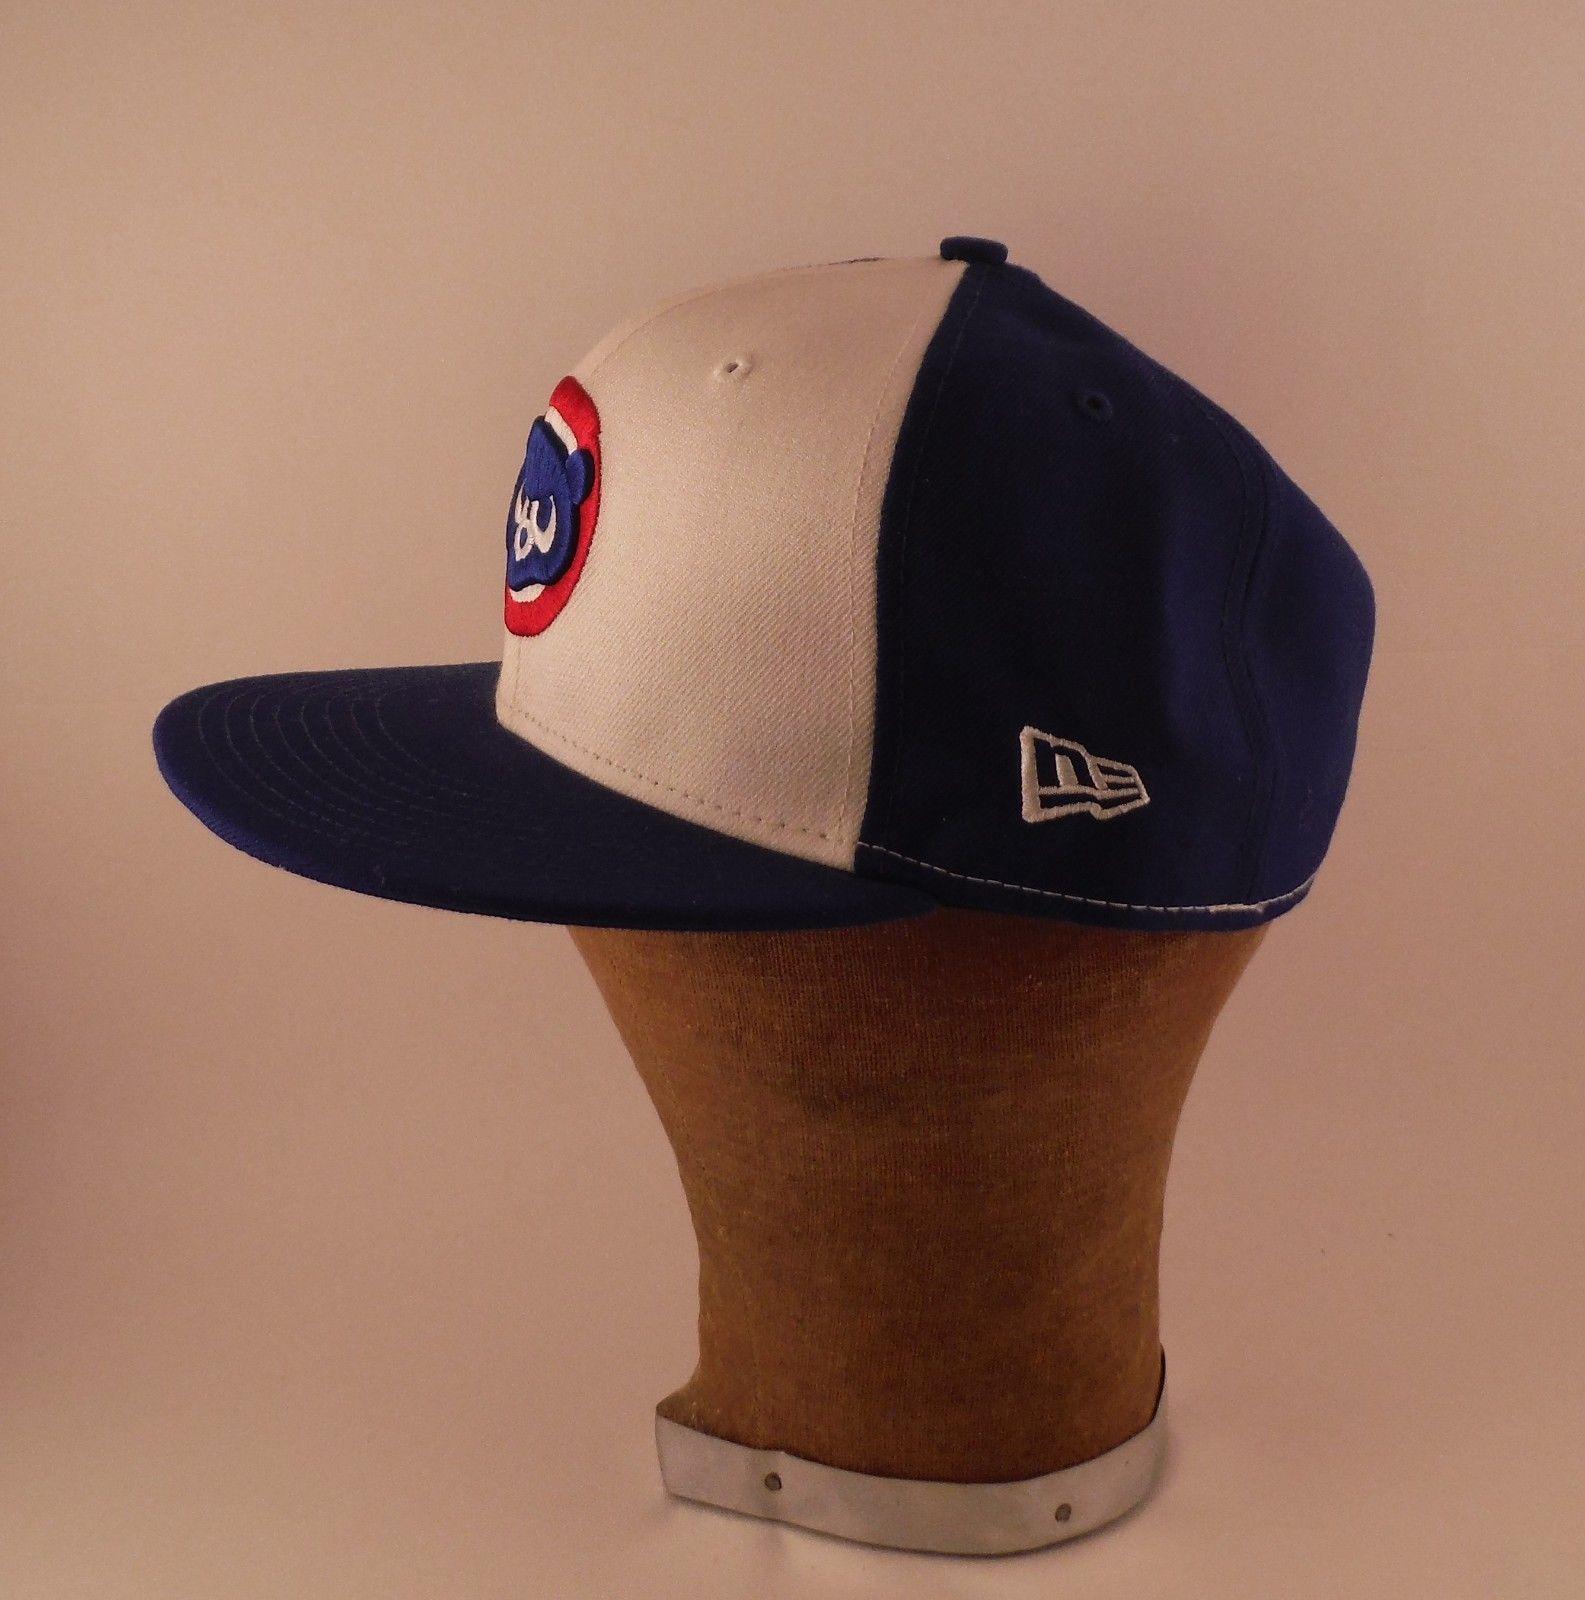 3baddfee92a Chicago Cubs Cub Logo 100% Wool New Era Baseball Hat Cap Mens Fitted 7 3